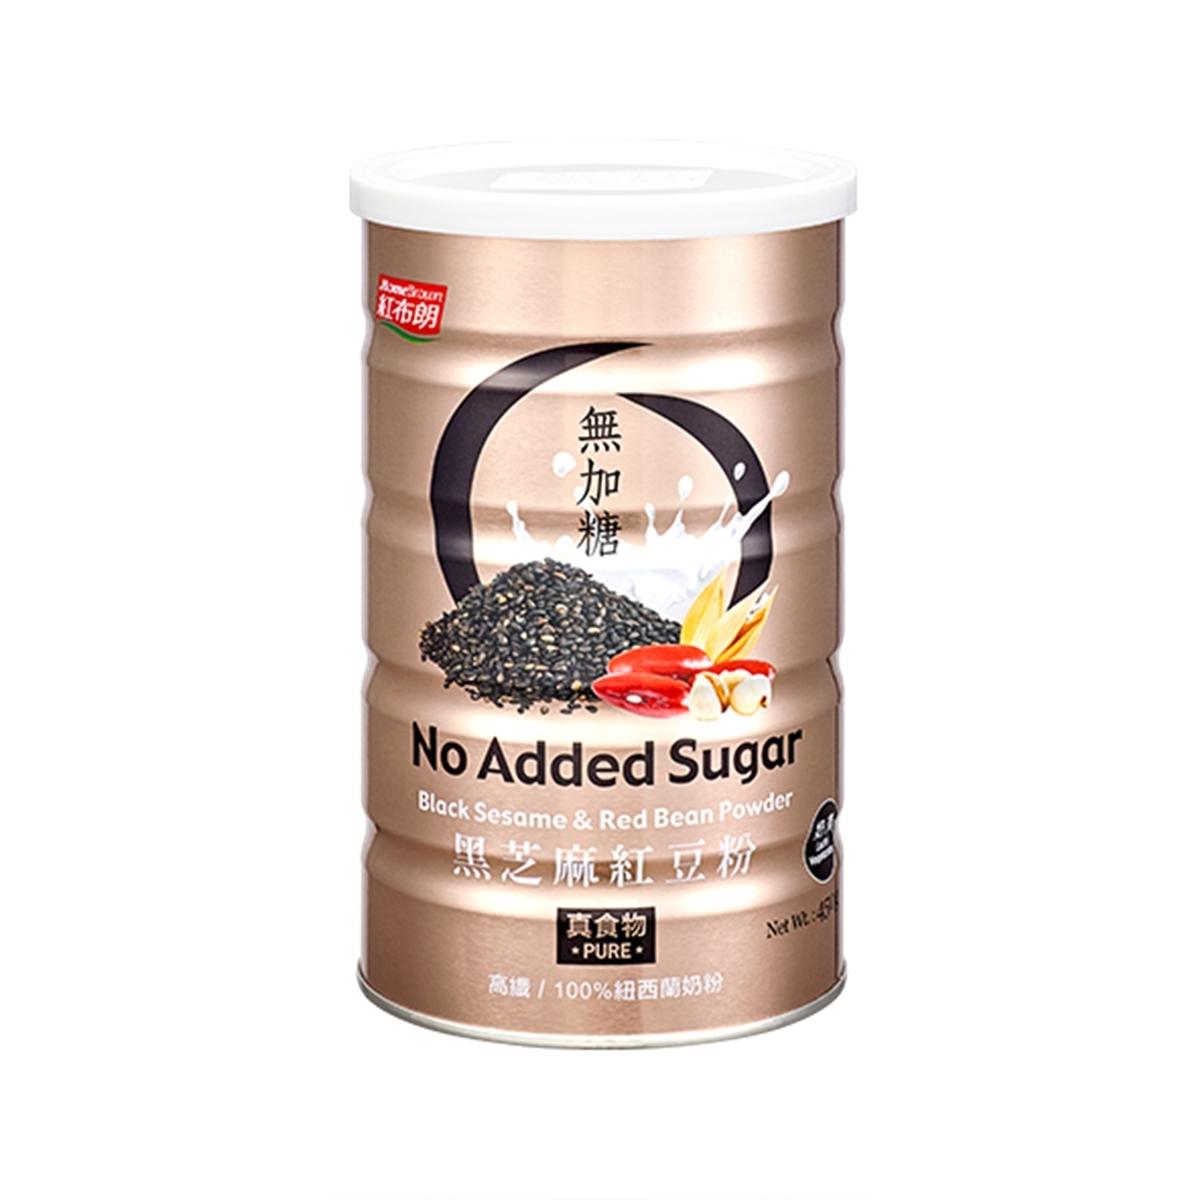 Black Sesame & Red Bean Powder (No sugar added)